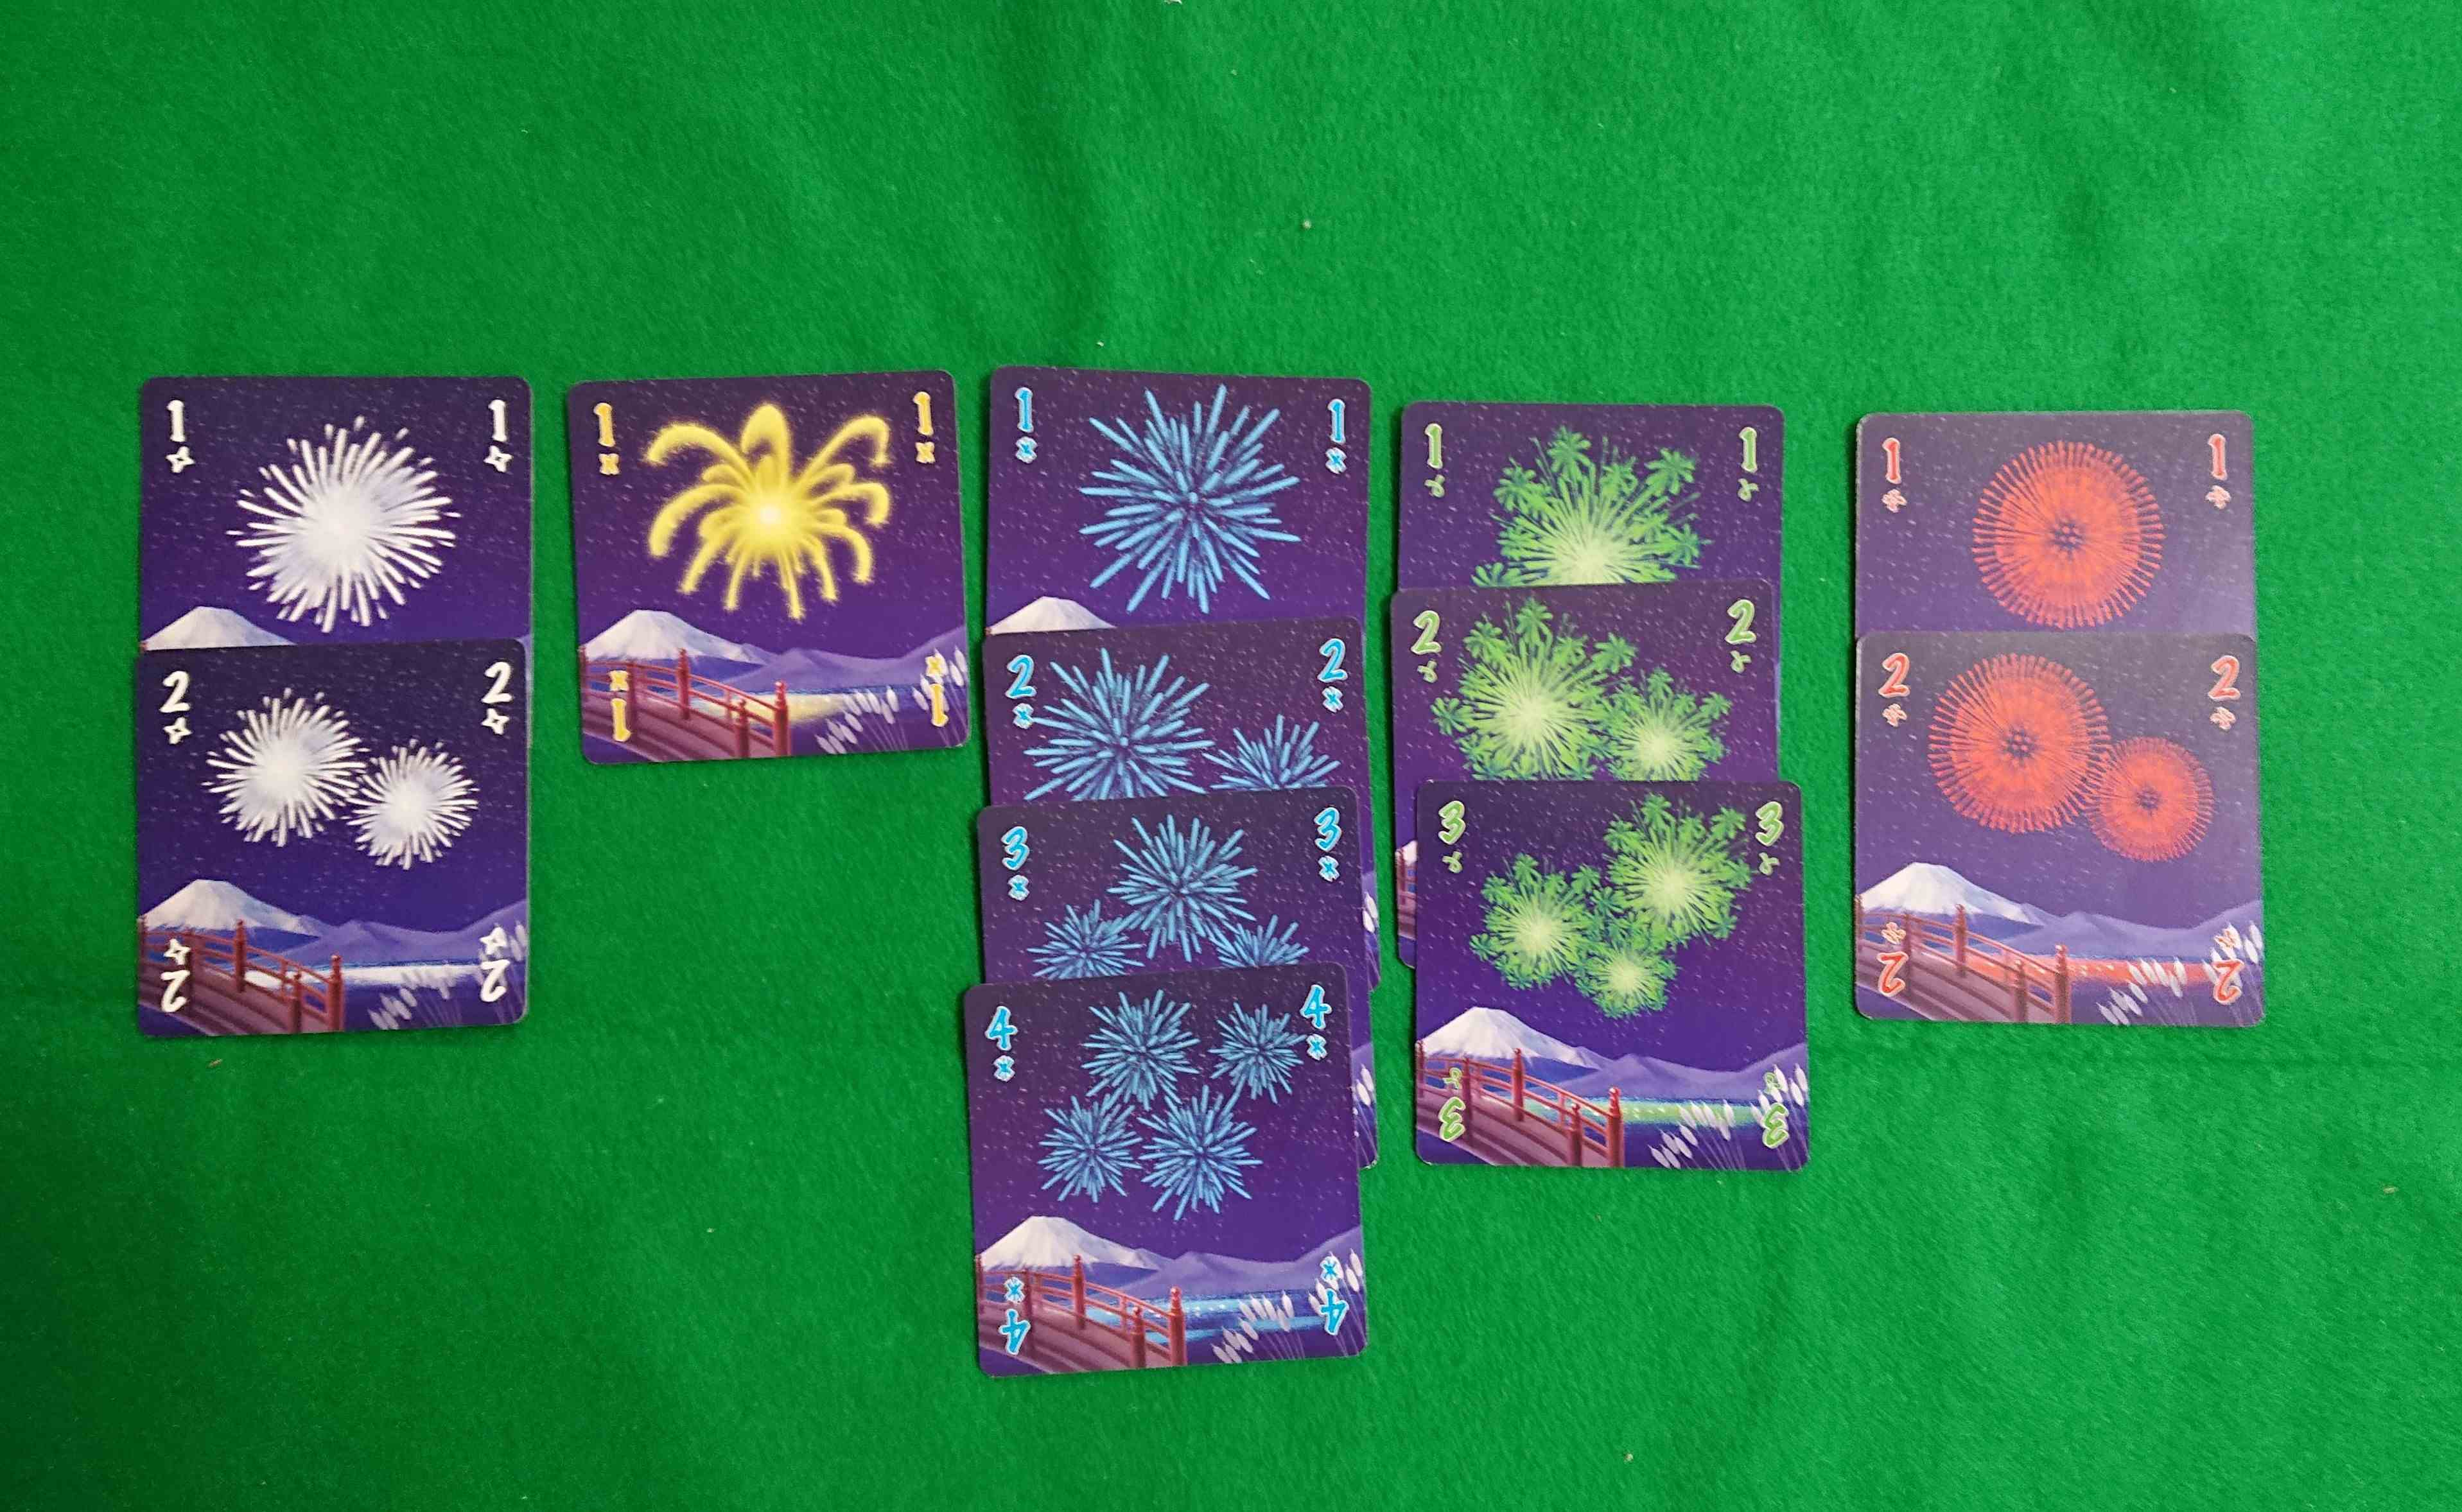 HANABI(花火)綺麗な花火打ち上げよう! カードゲーム